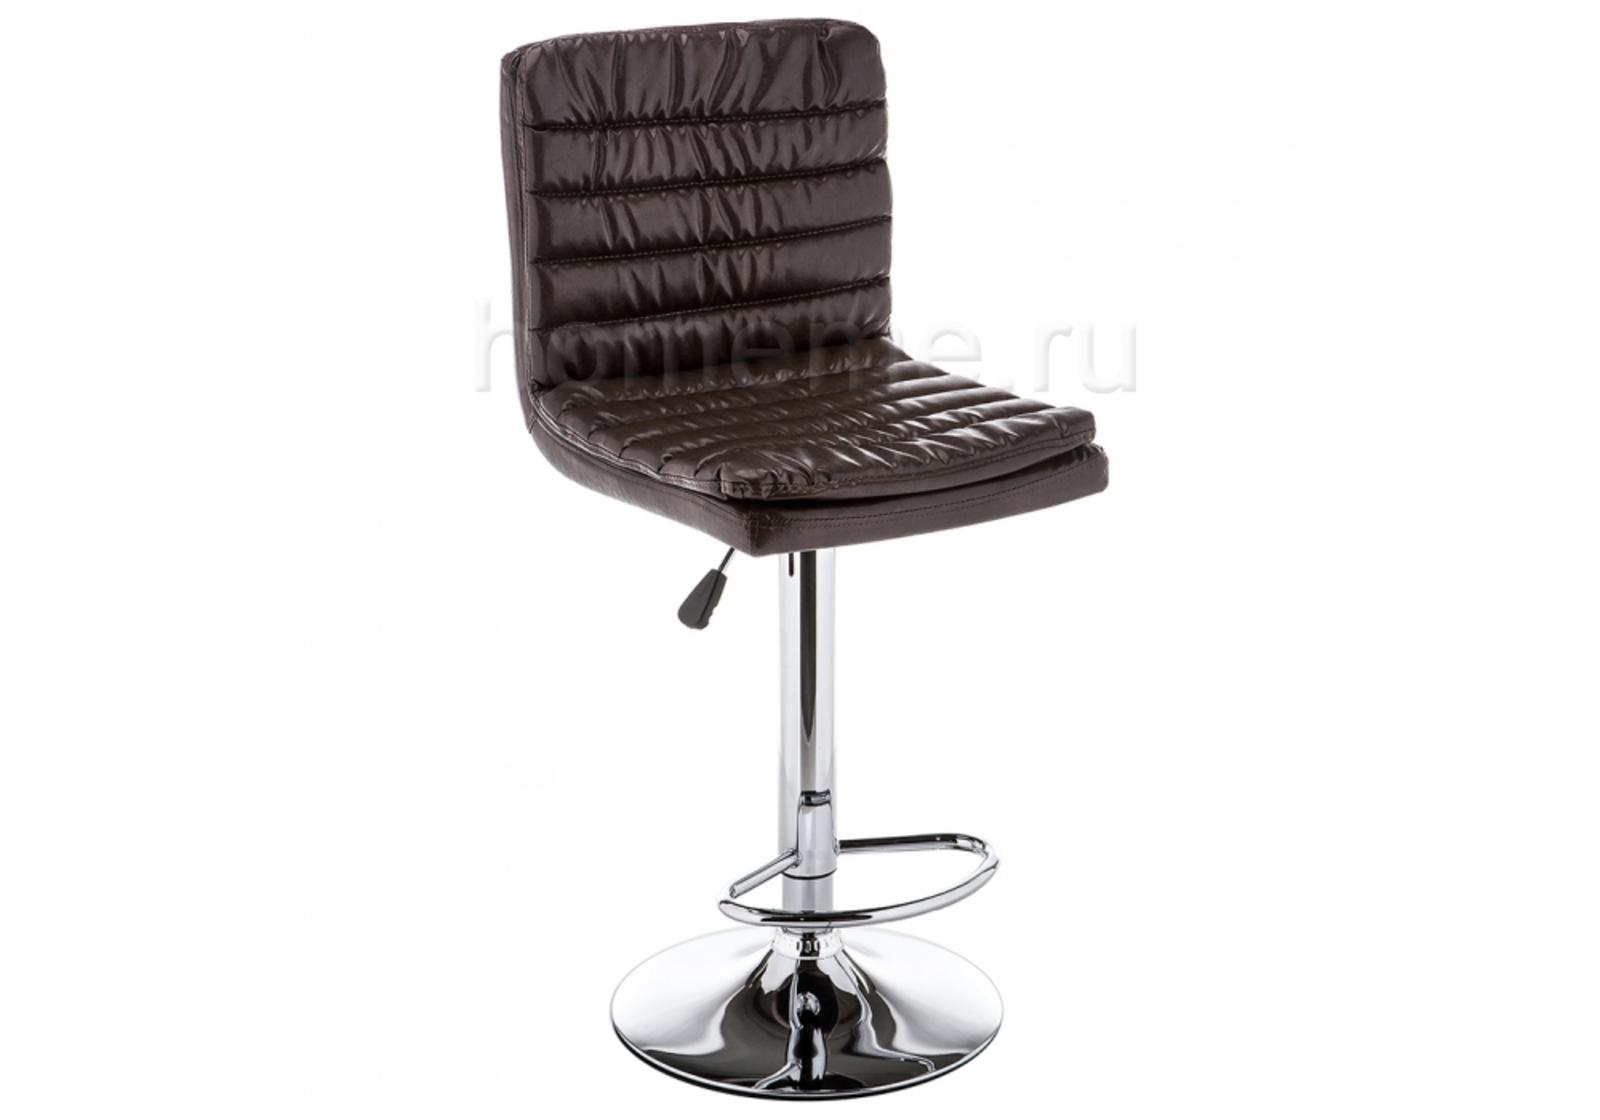 Барный стул Mins vintage 11290 Mins vintage 11290 (15684)